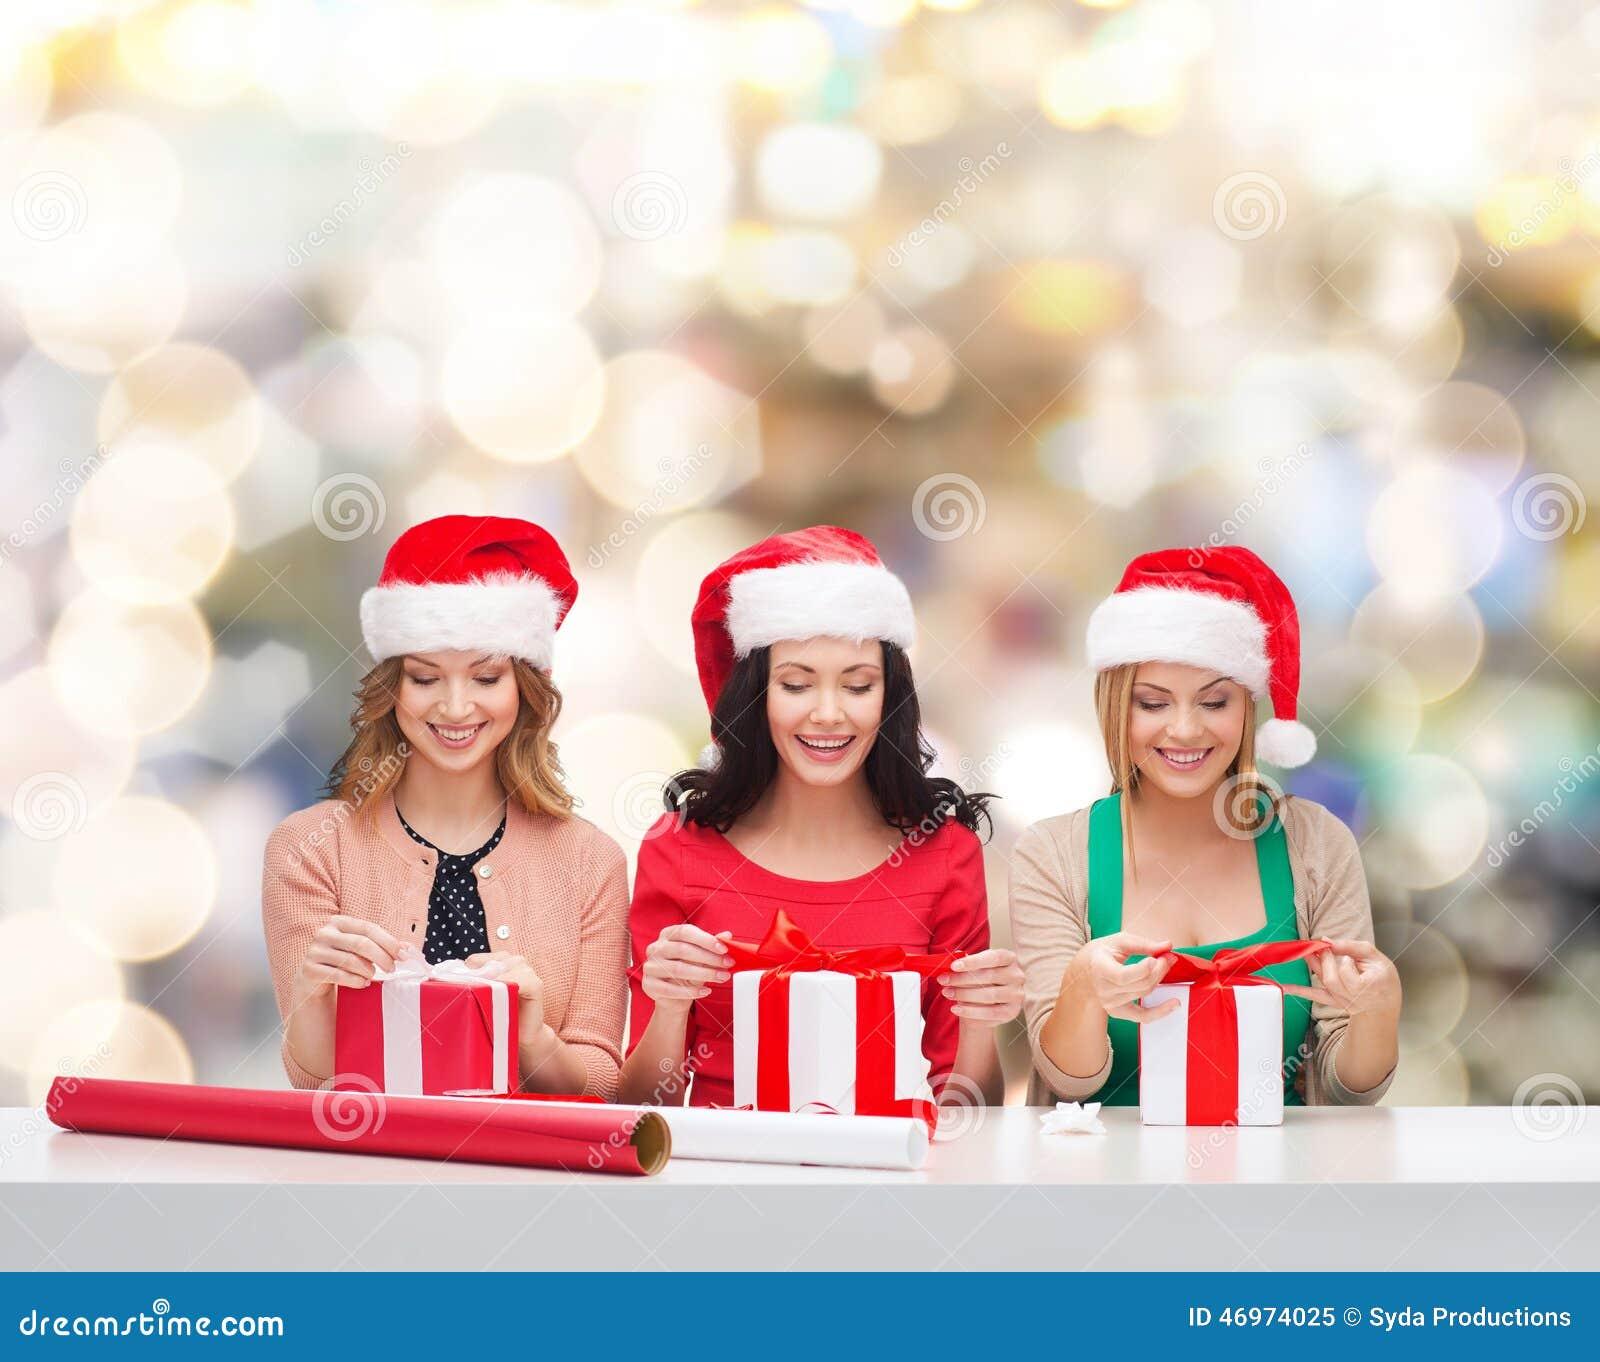 Grandpa Christmas Ornaments